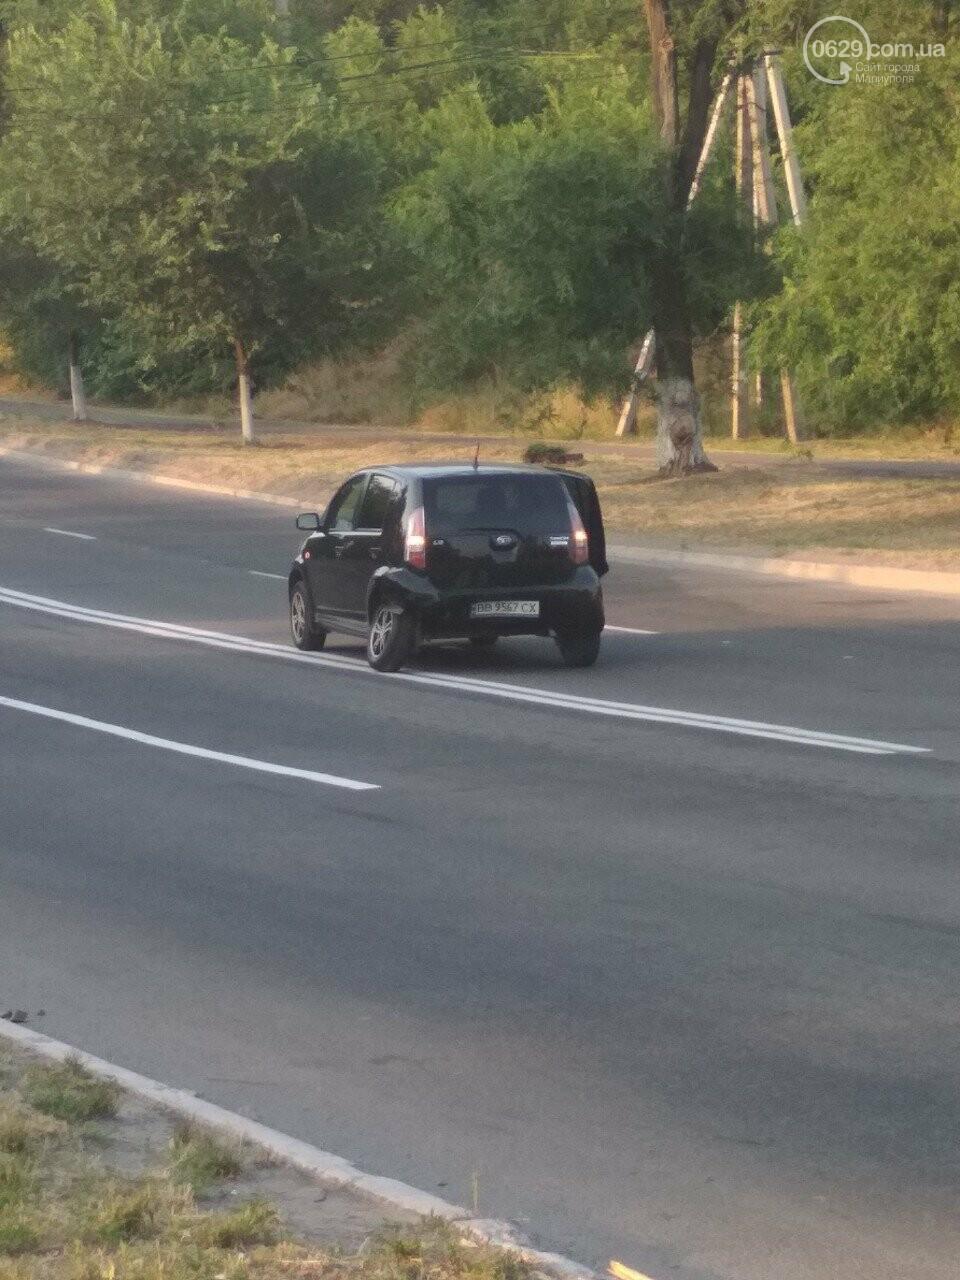 В Мариуполе иномарка столкнулась с такси, - ФОТО, фото-3